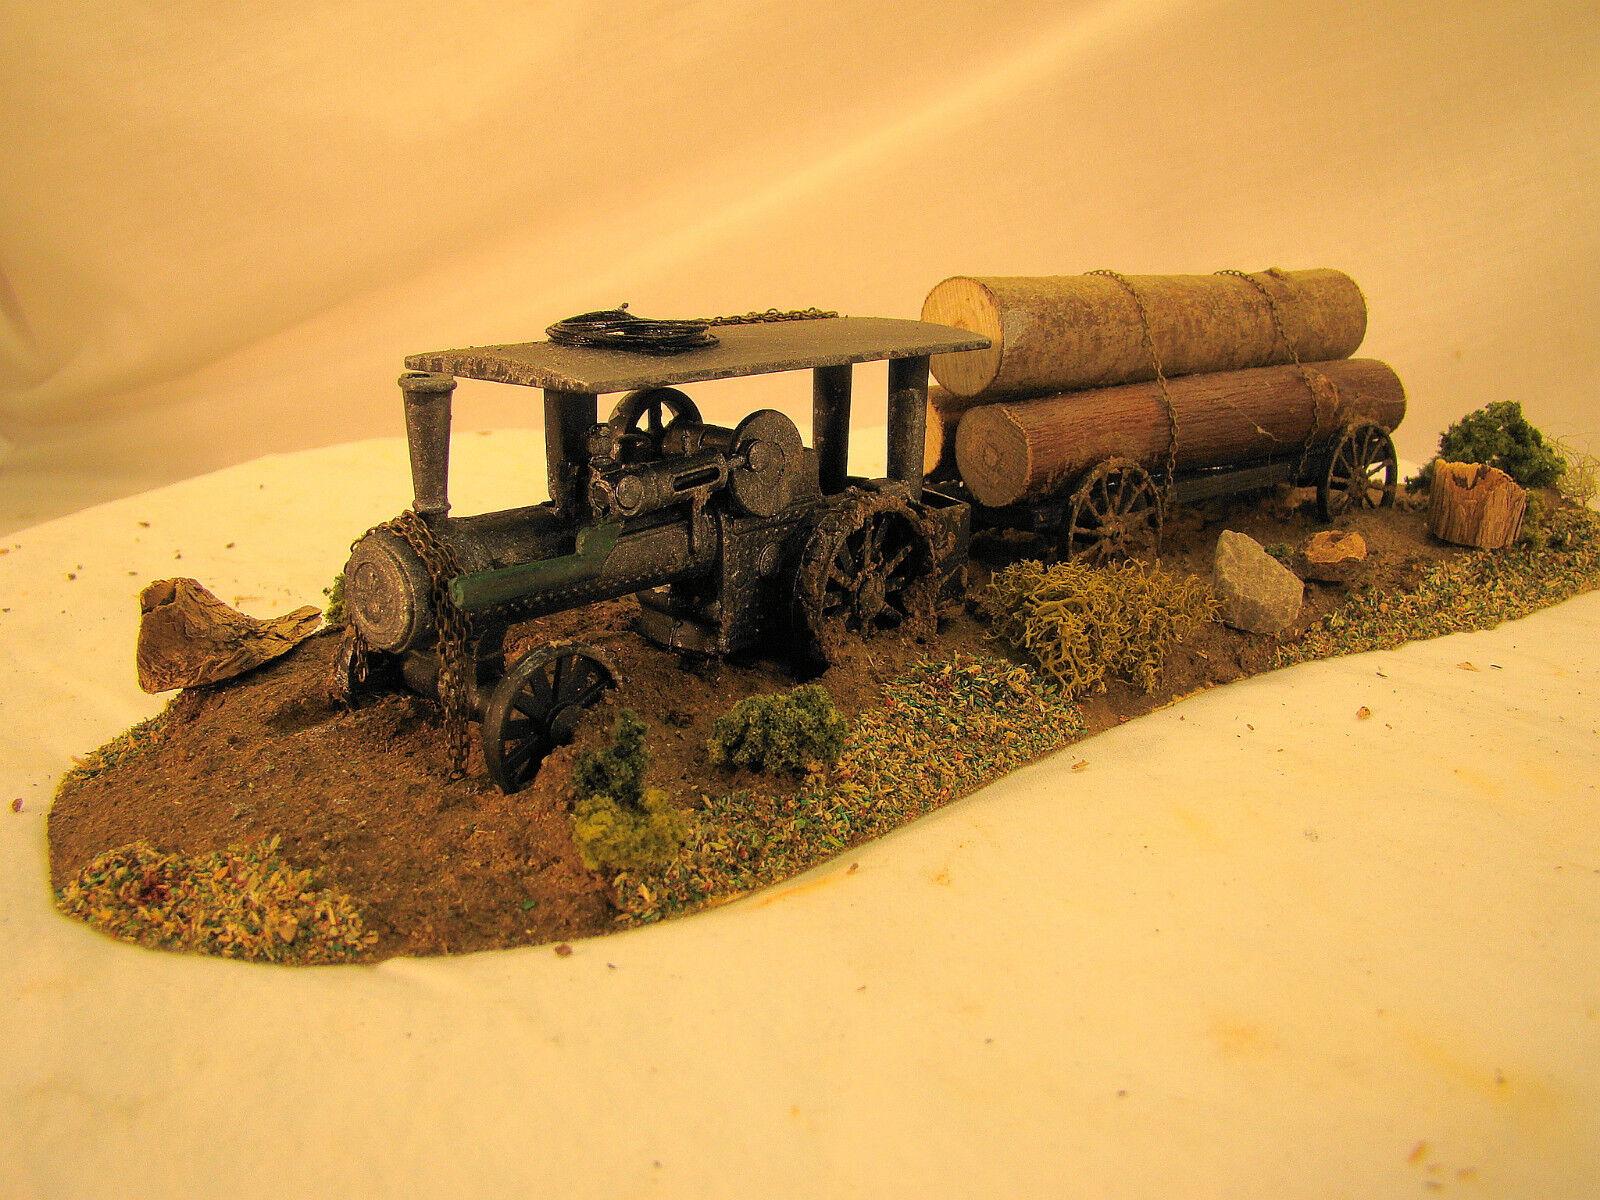 Tractor de vapor registro Diorama-Personalizado resistido-On30 Escala O o escala